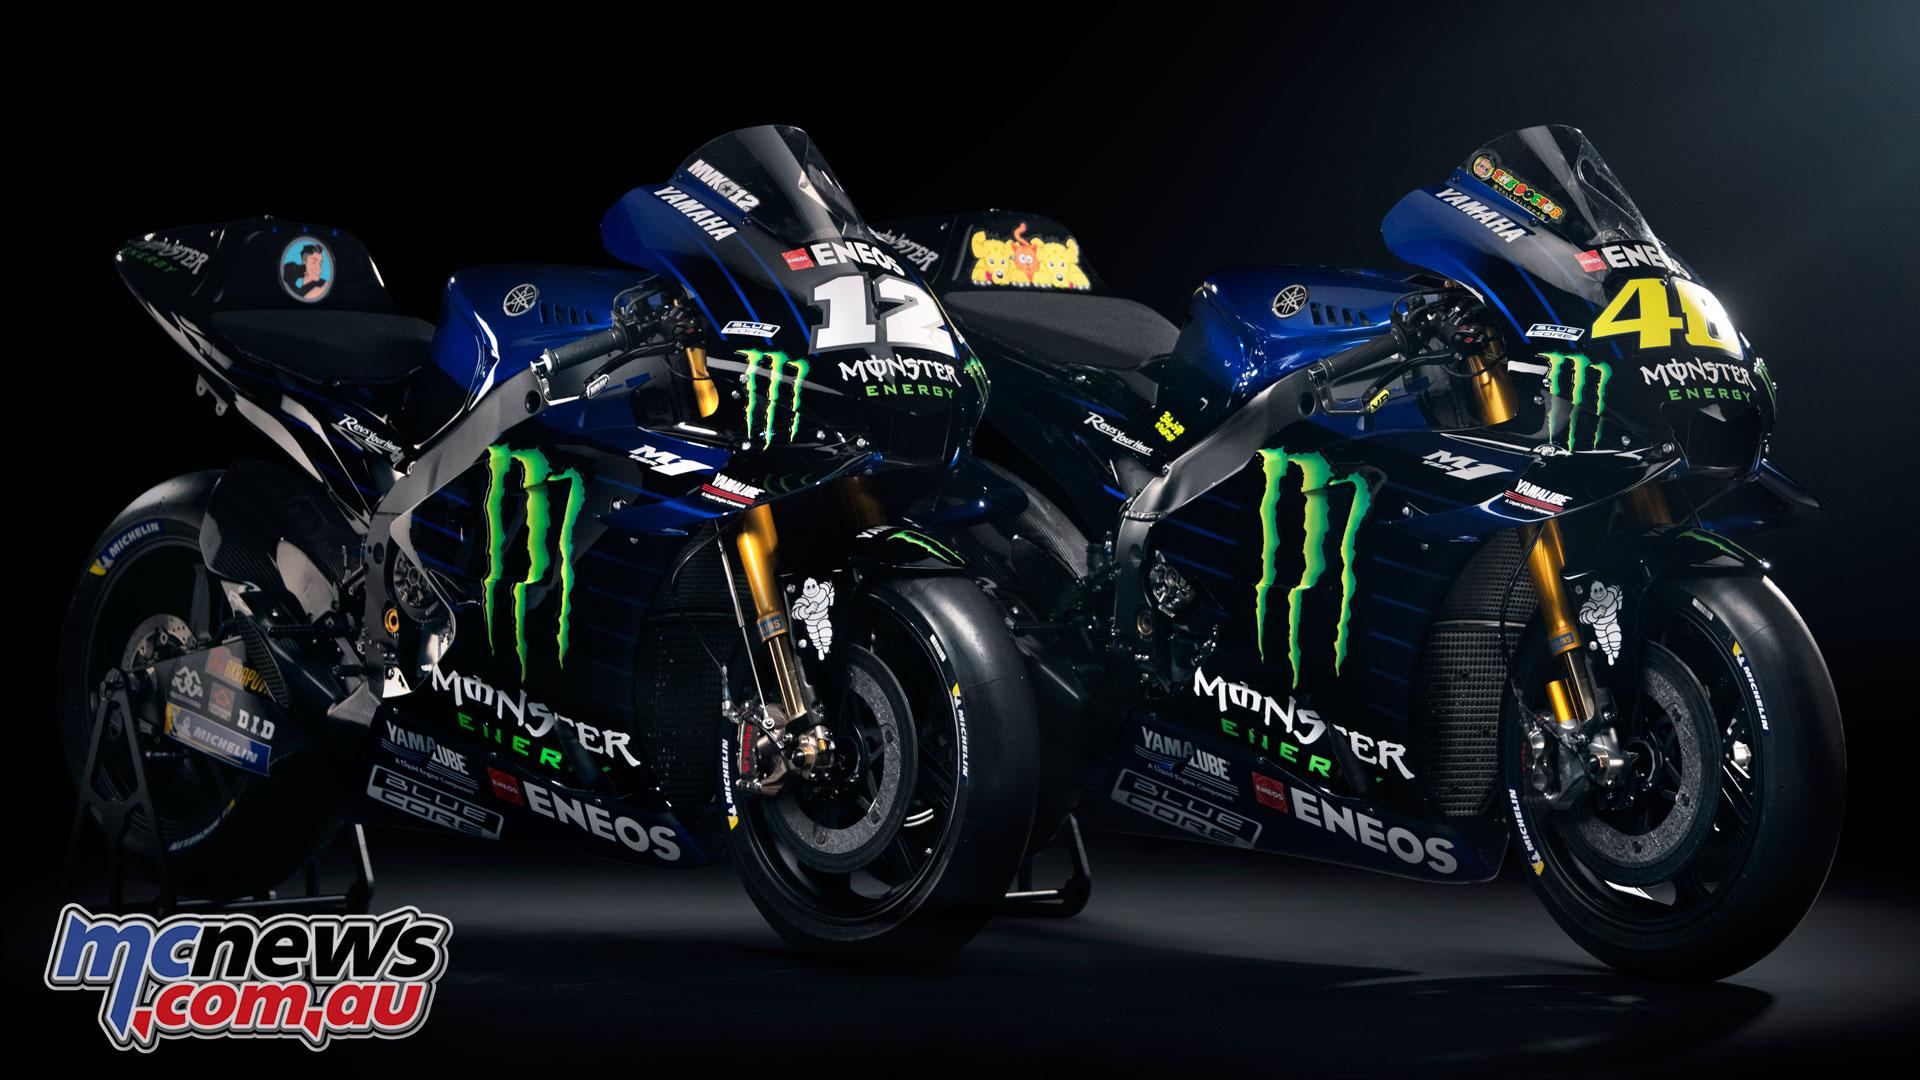 Monster Energy Yamaha MotoGP unveil 2019 livery MCNewscomau 1920x1080